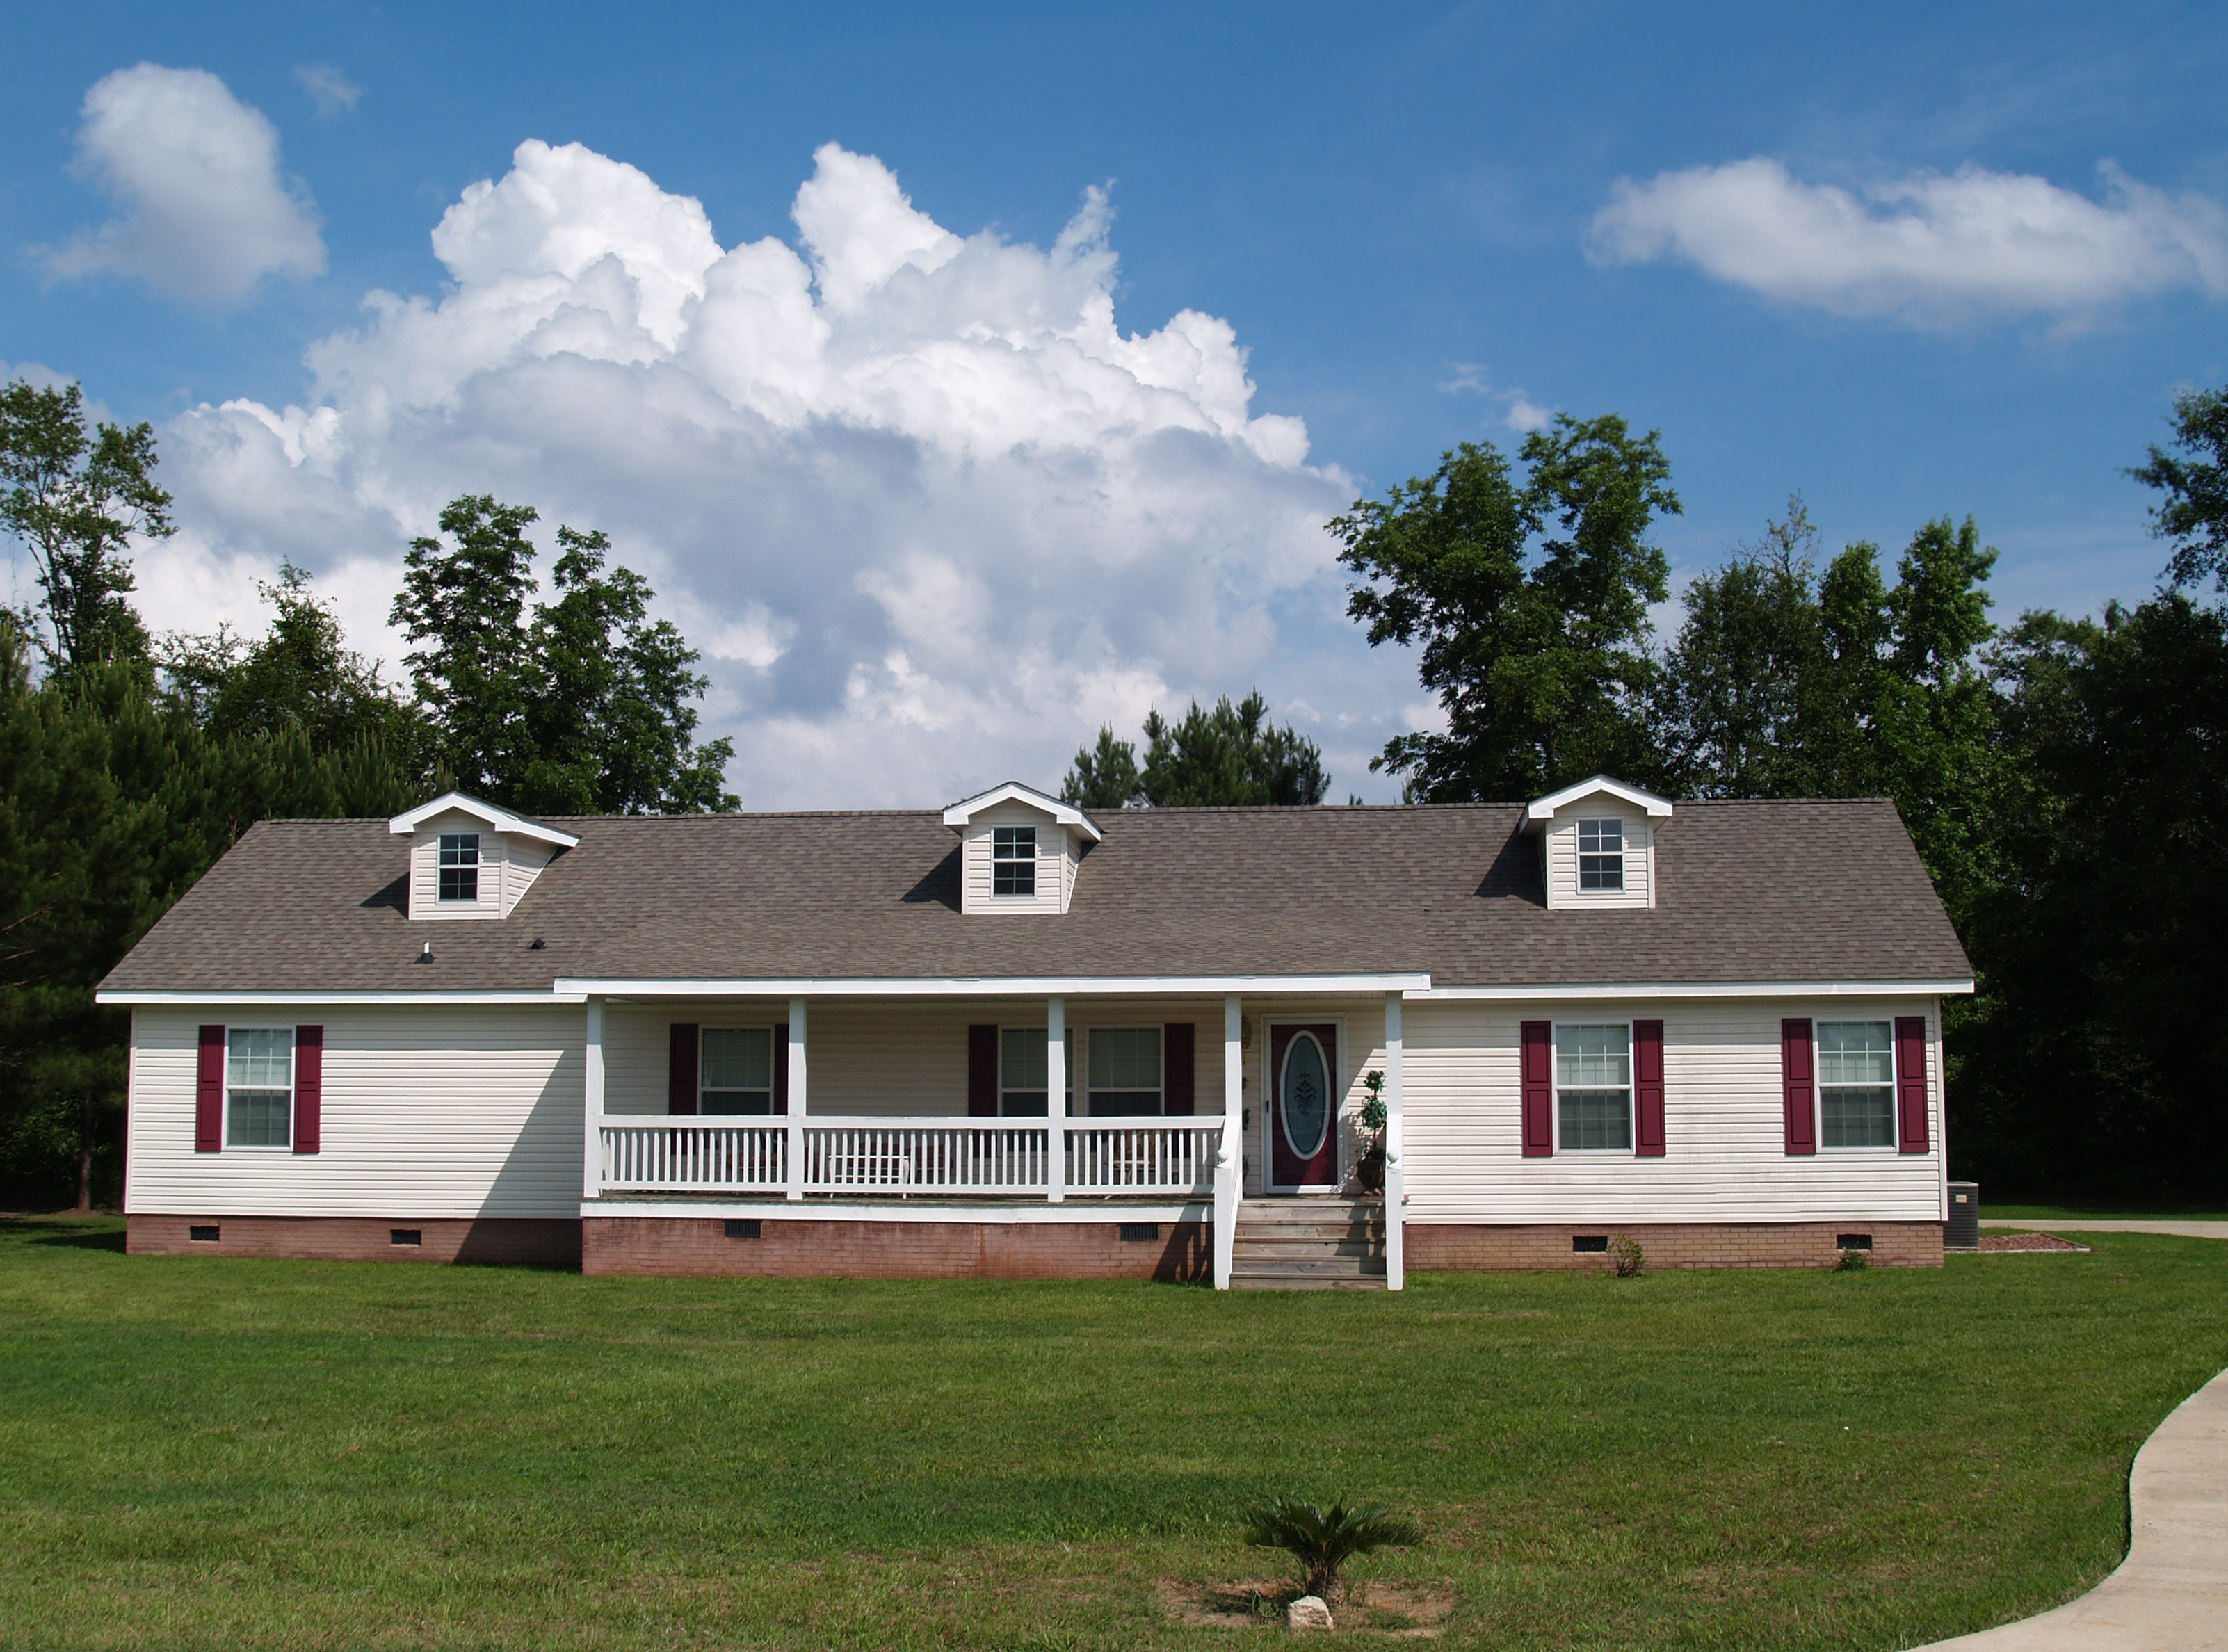 entry level home profits increase